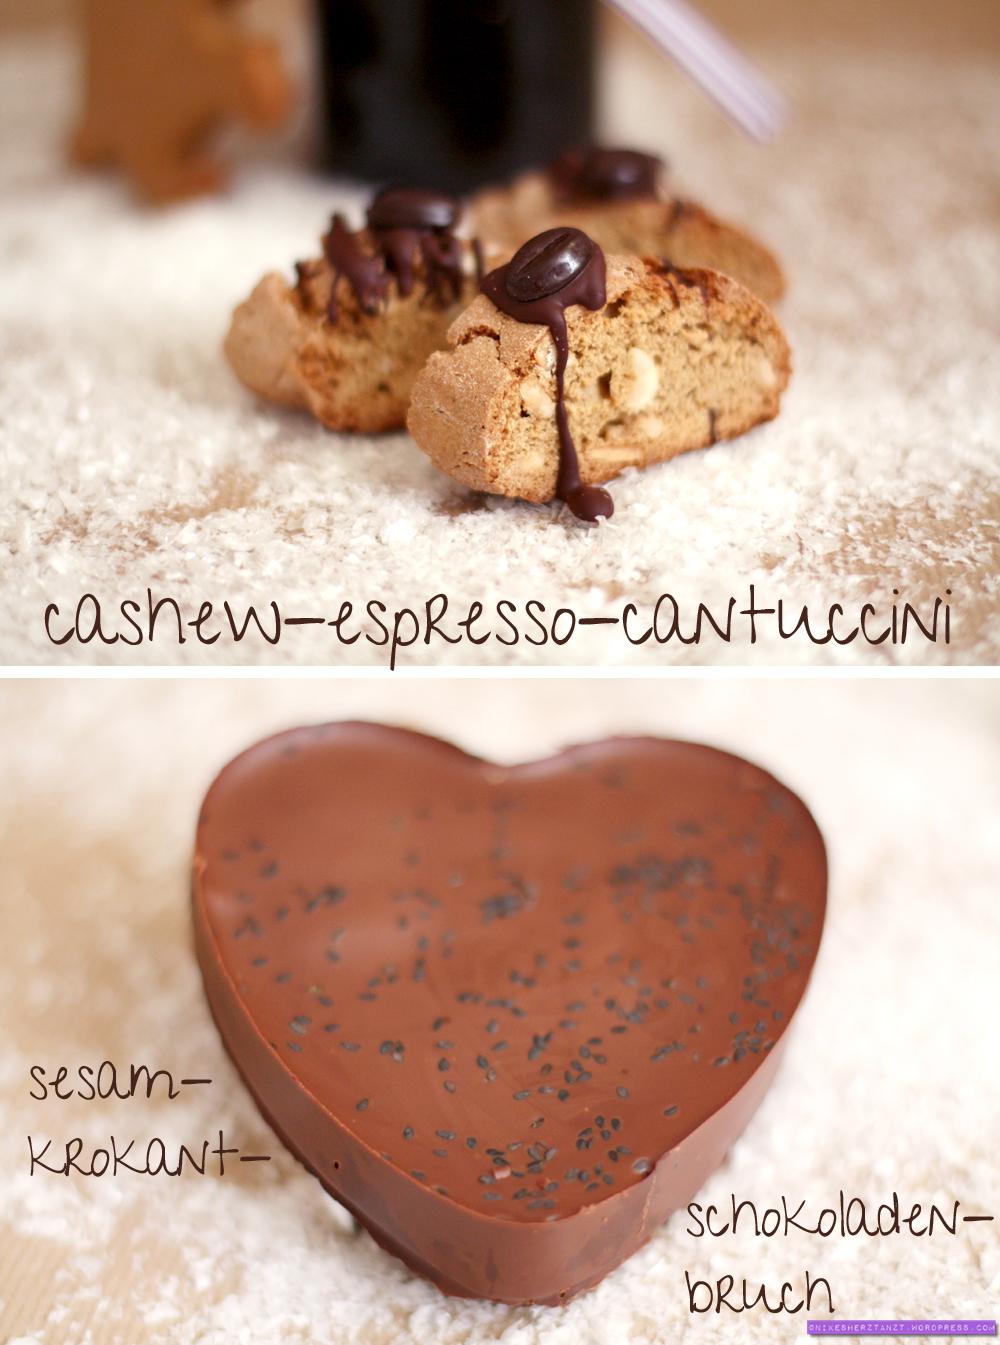 PamK, Weinnachtsbäckerei, Plätzchen, Rezepte, nikesherztanzt, Kekse, food, blog